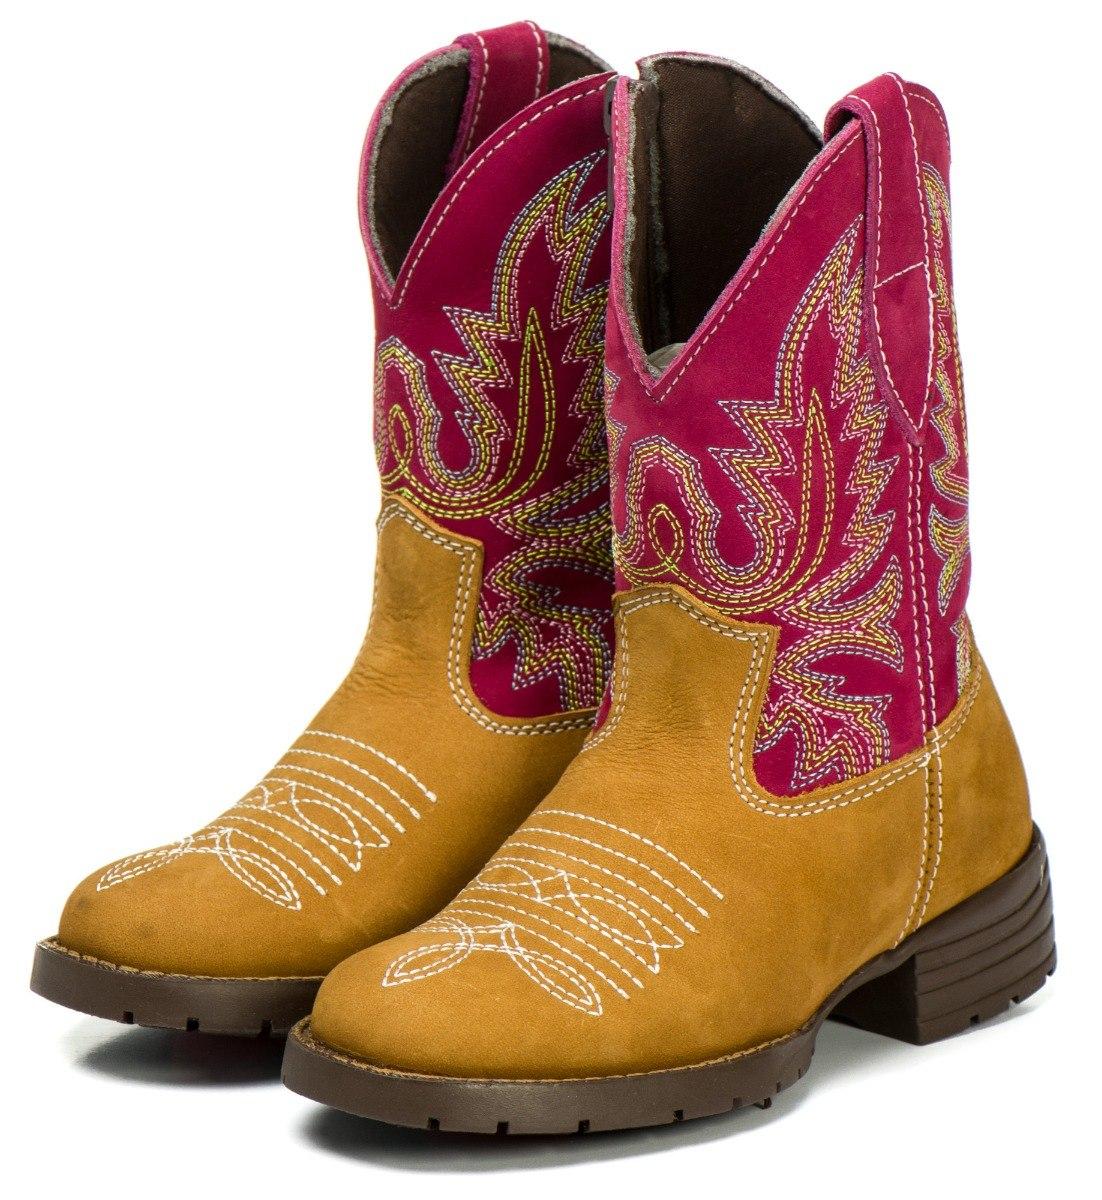 bota botina country infantil texana rodeio masculino feminin. Carregando  zoom. 6b8028943be